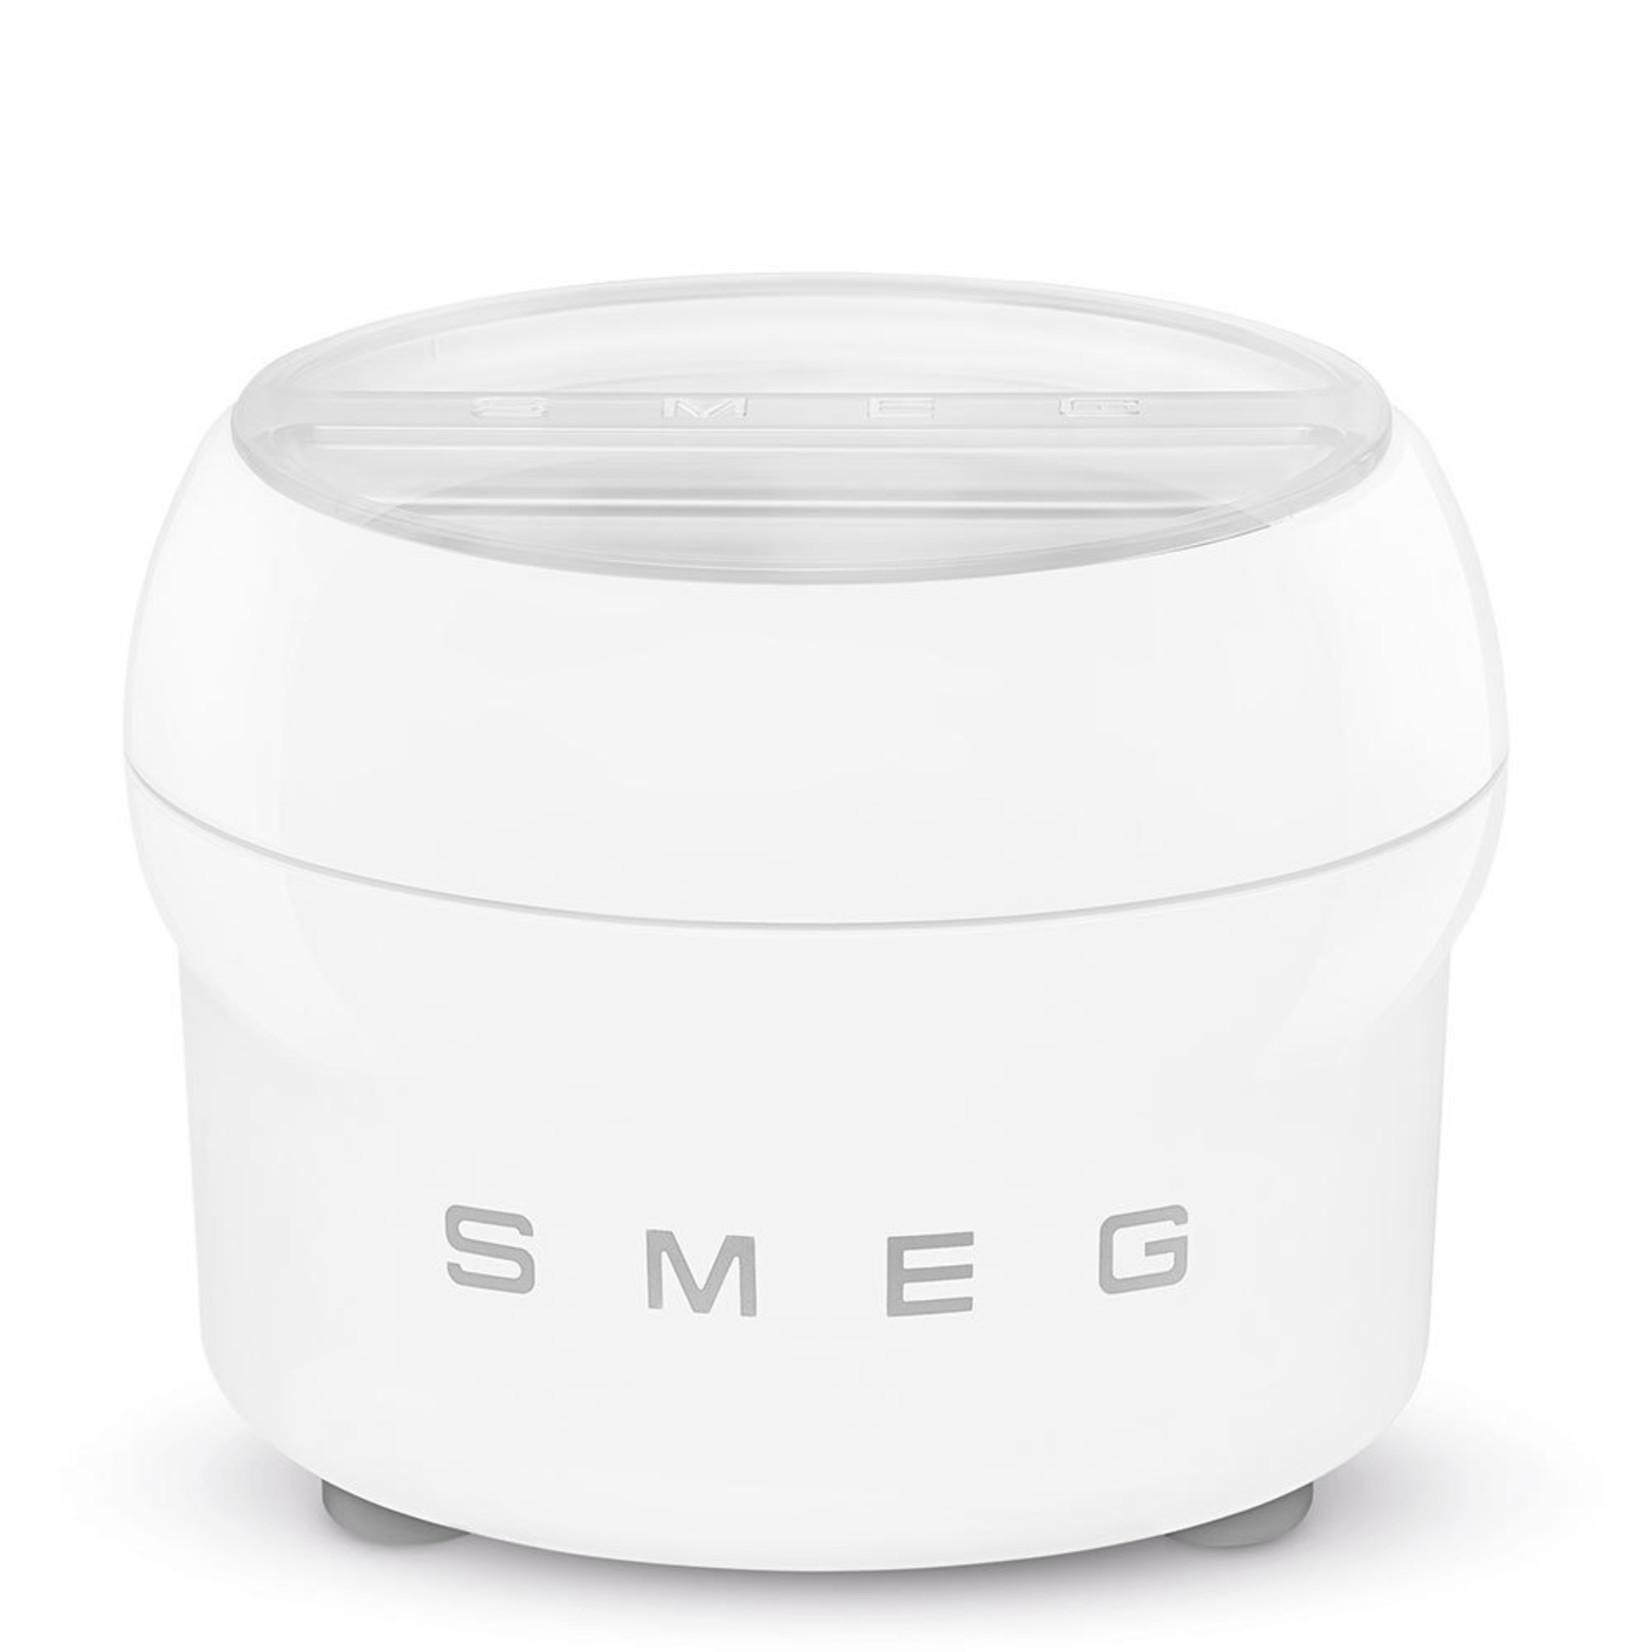 Smeg Smeg SMIC02 ijsmaker voor keukenmachine